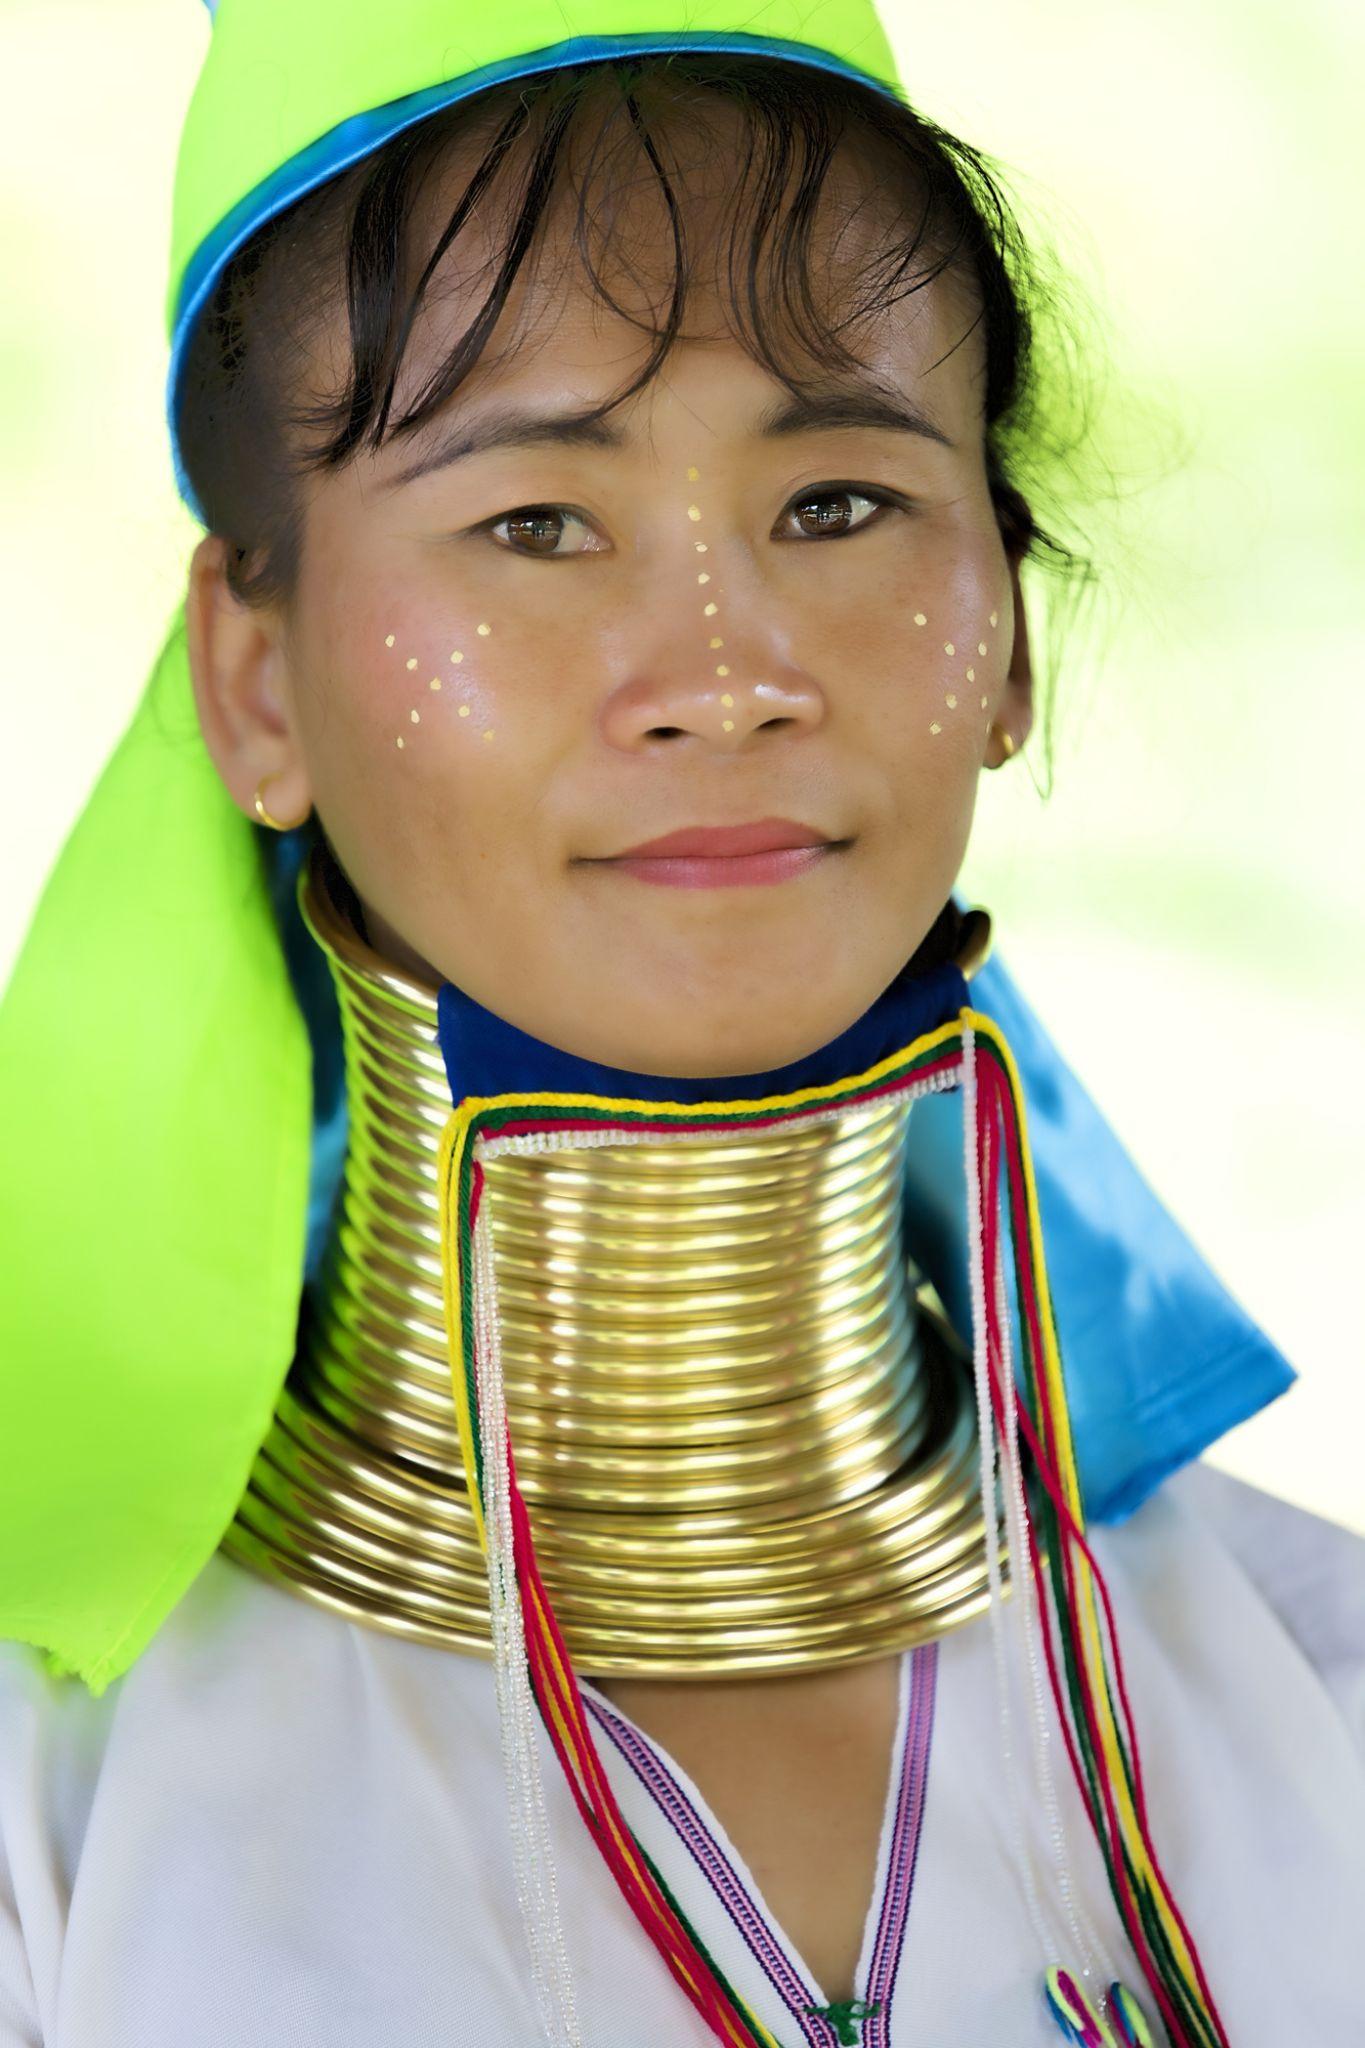 Pretty long neck woman from Burma living in Chiang Mai by Faroe Islands Hiking